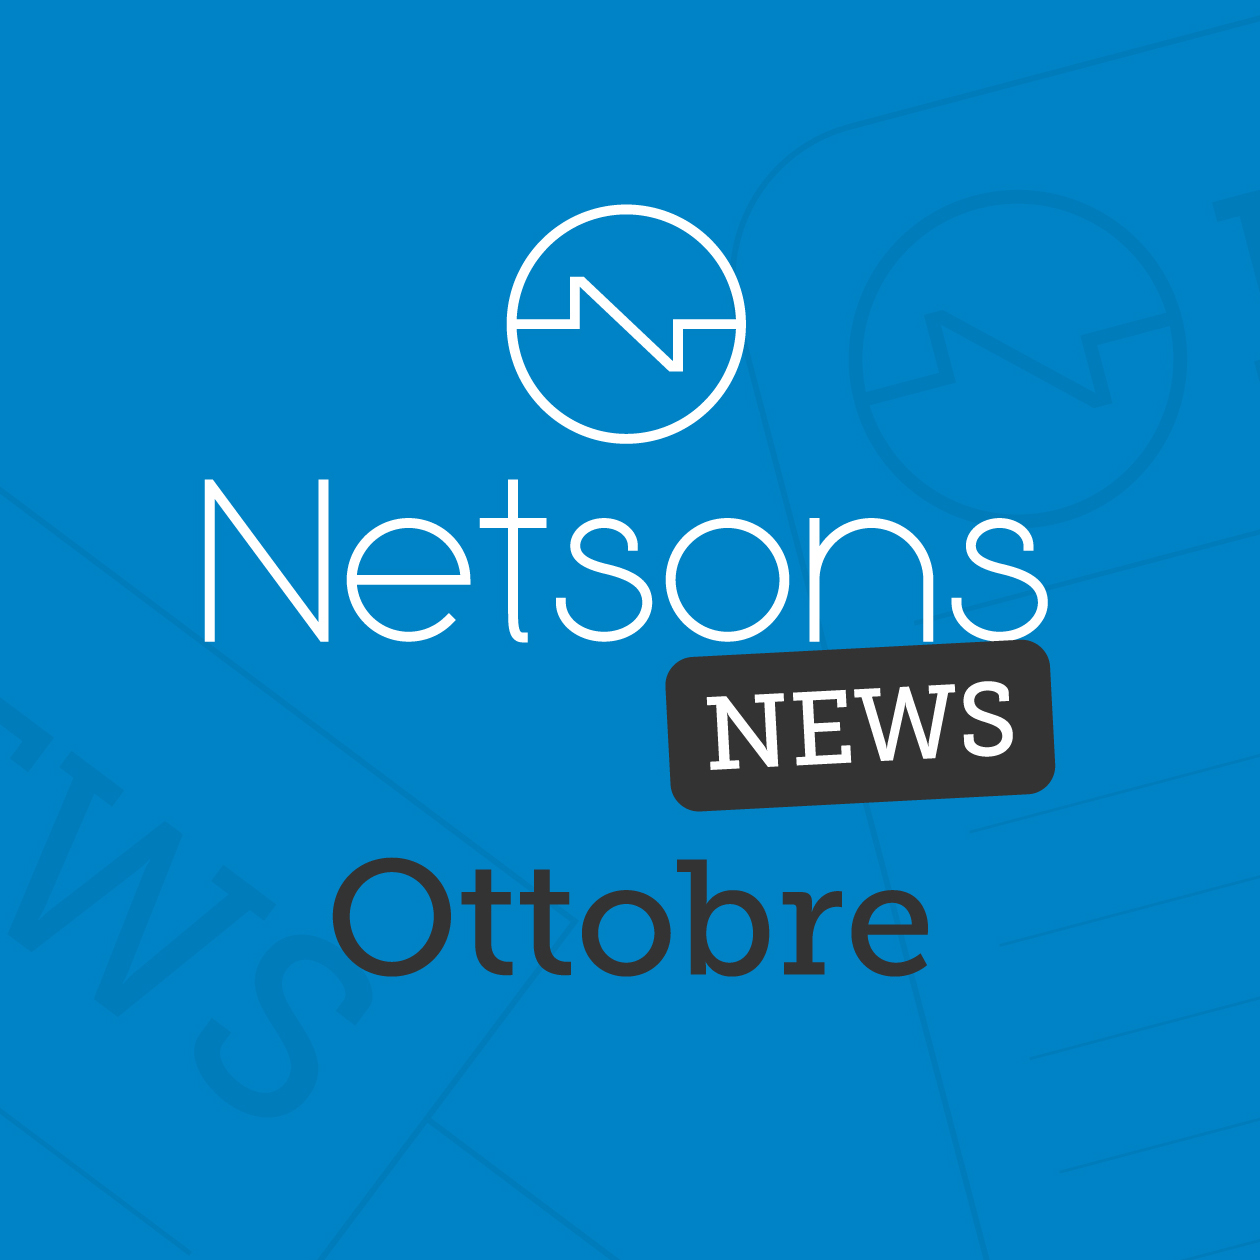 netsons news ottobre